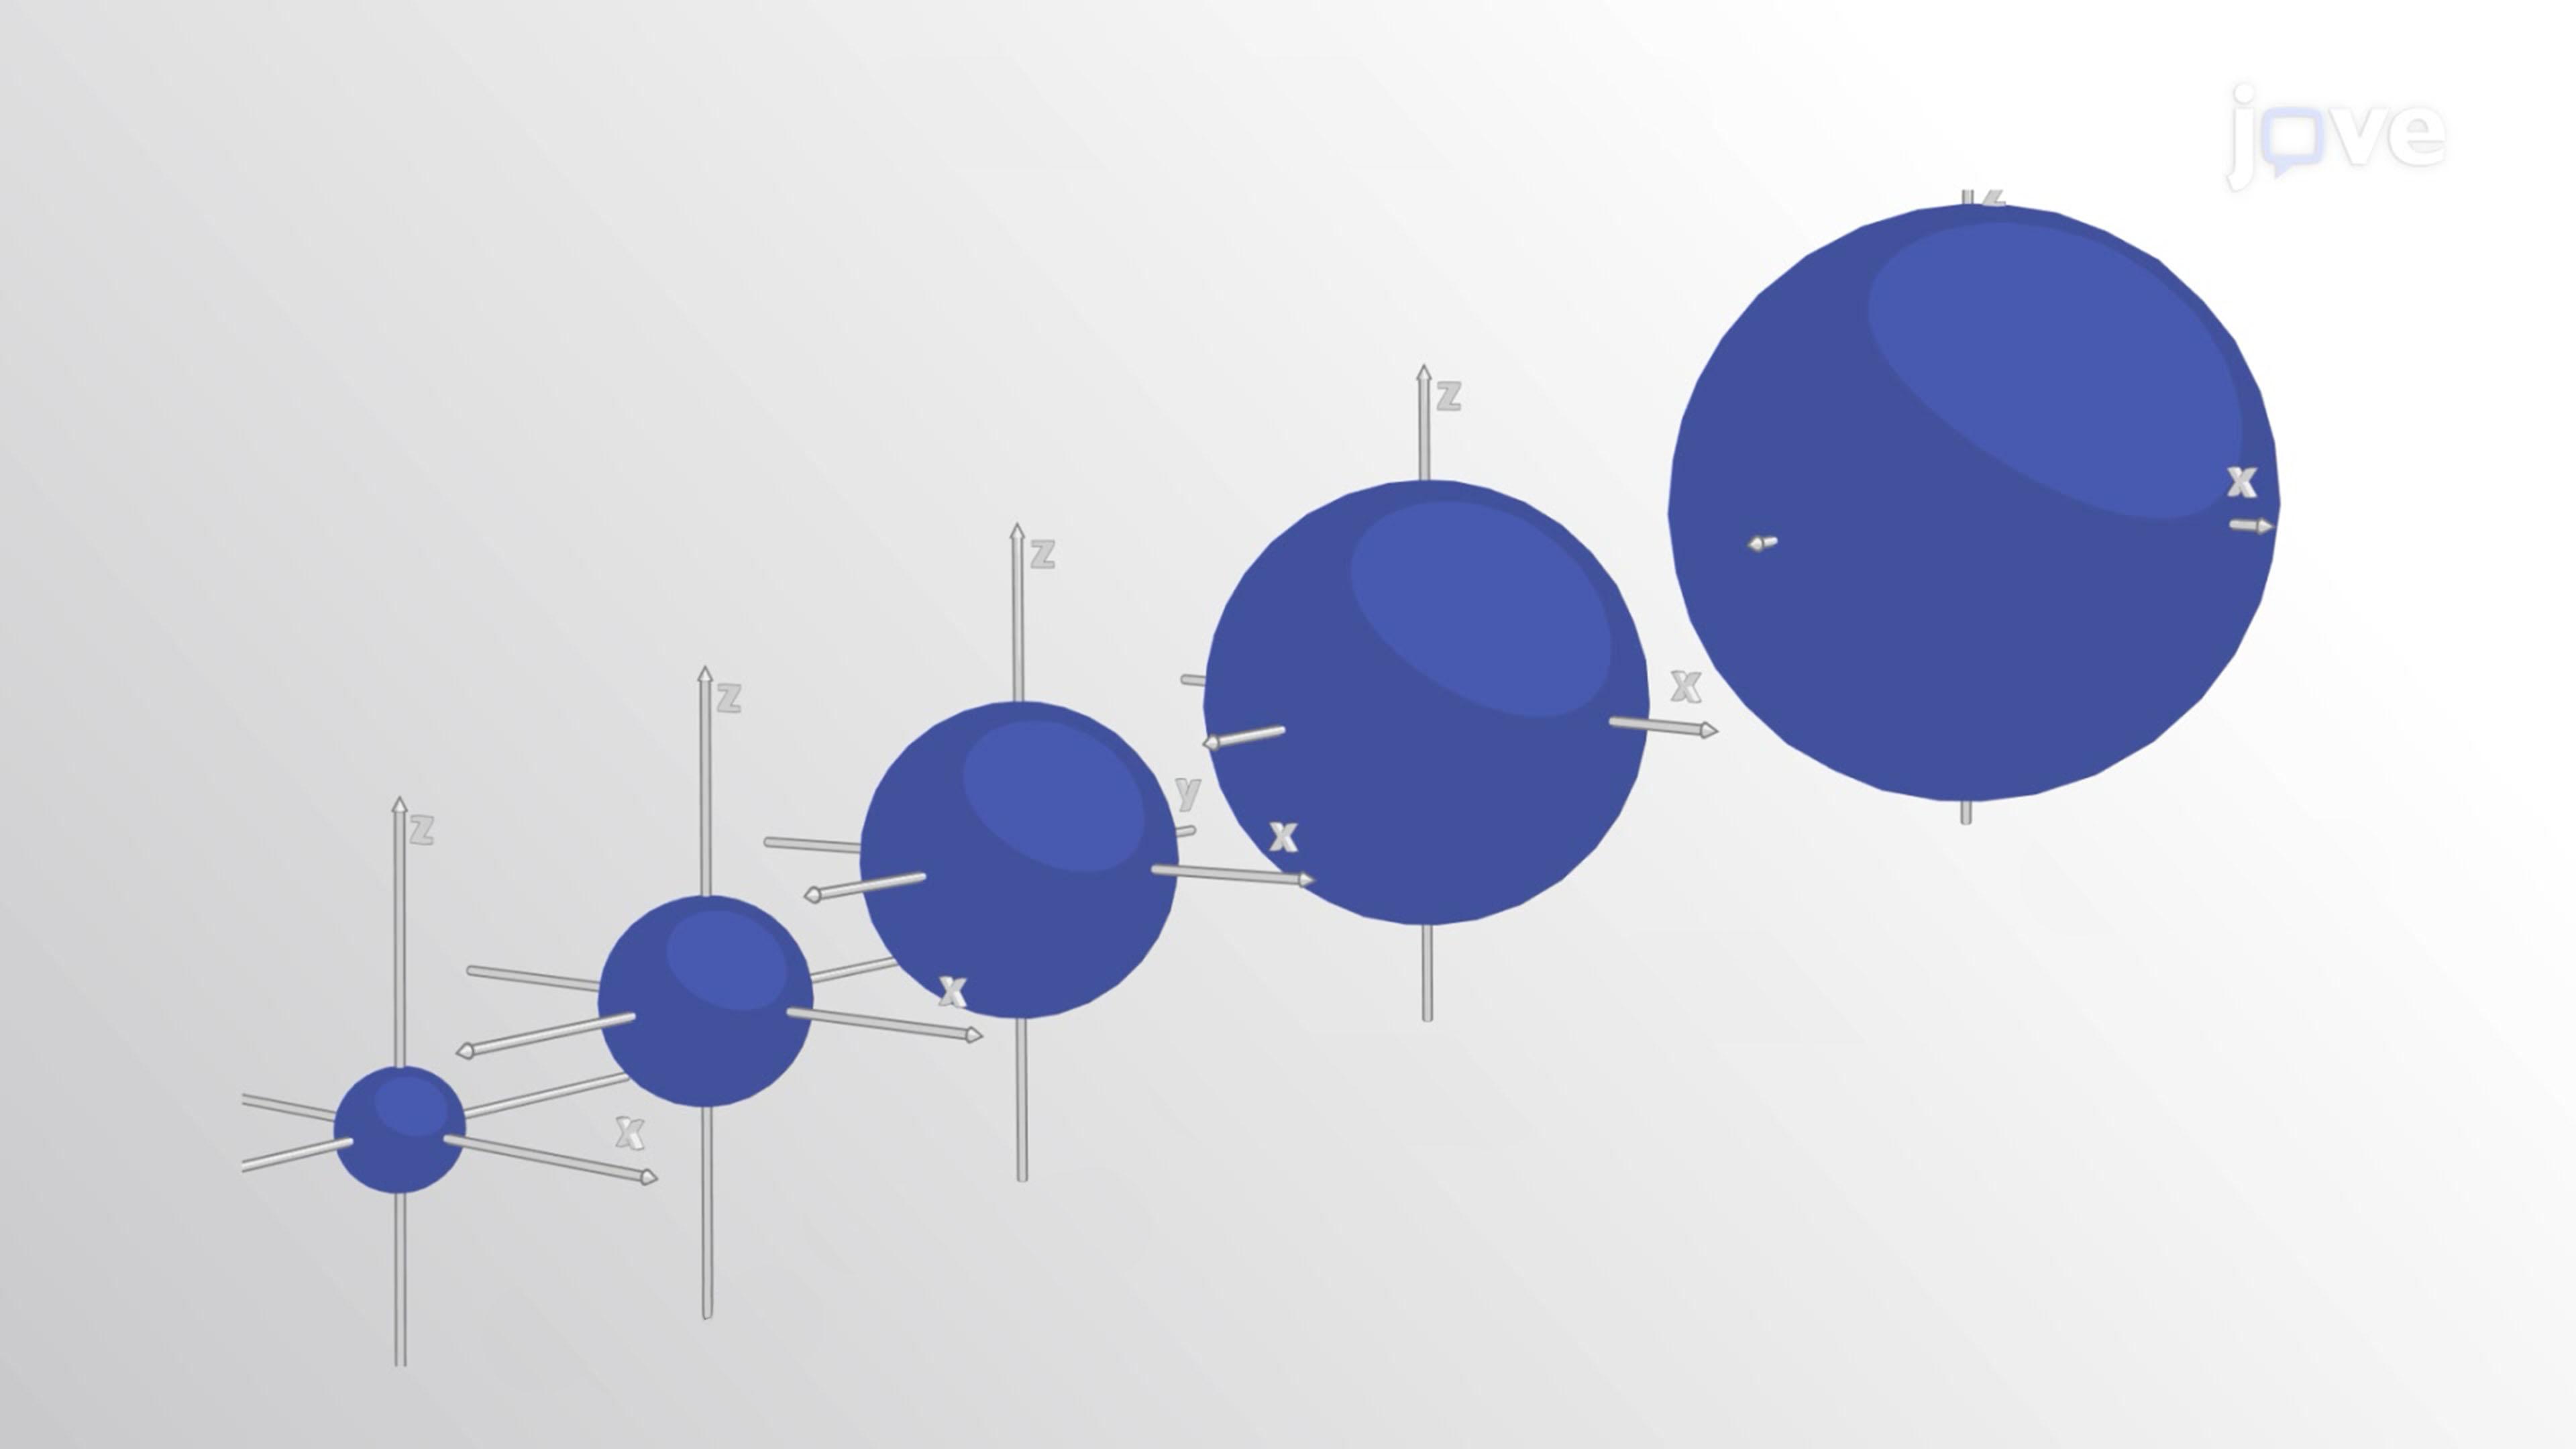 The Energies of Atomic Orbitals